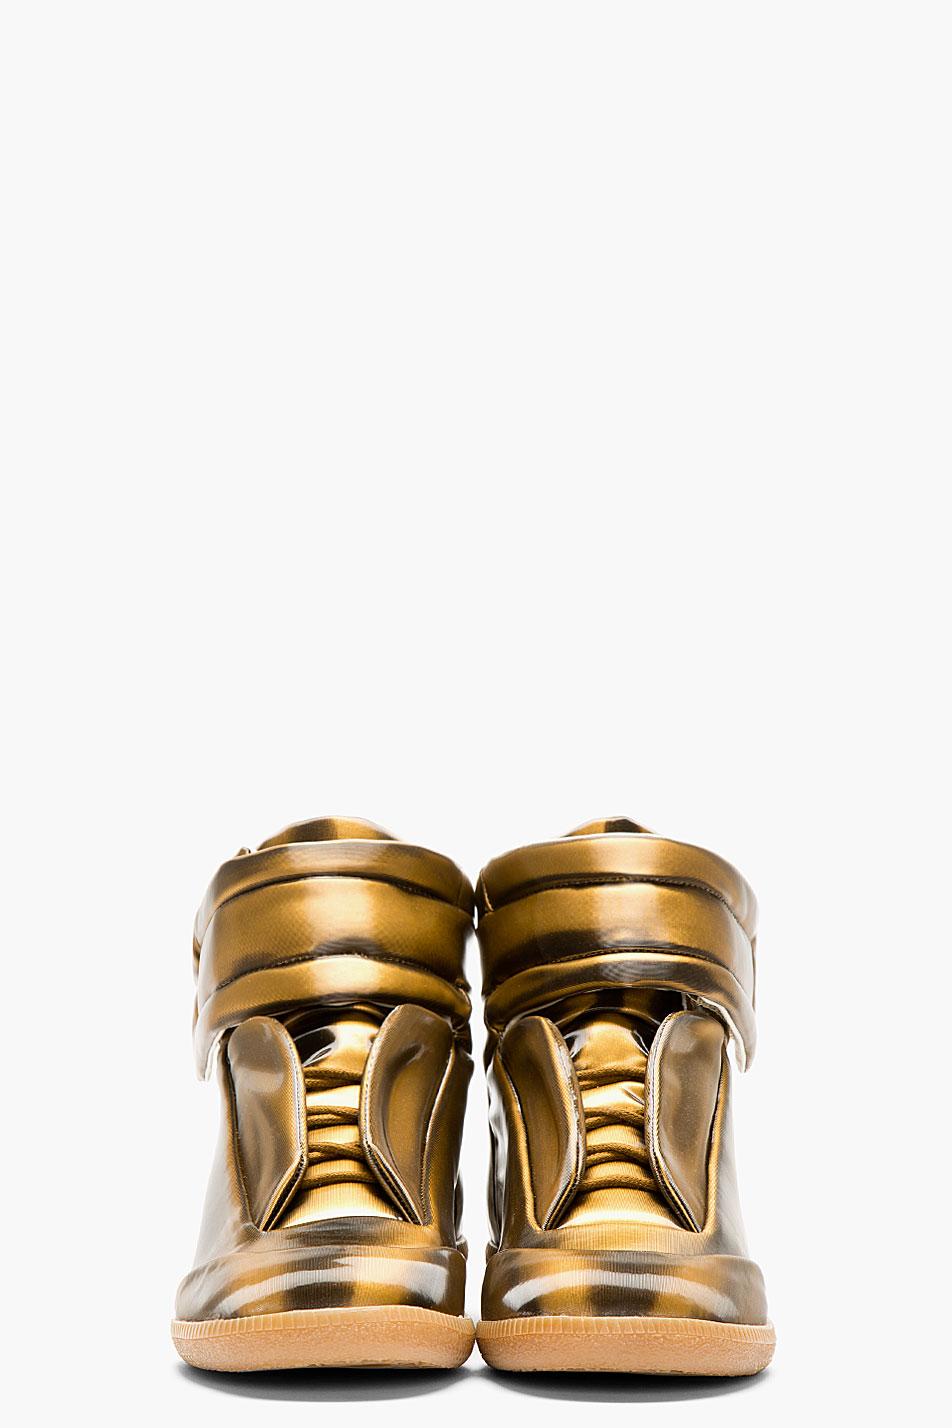 Copper Glossy Vinyl Maison Martin Margiela Gold Sneakers 2